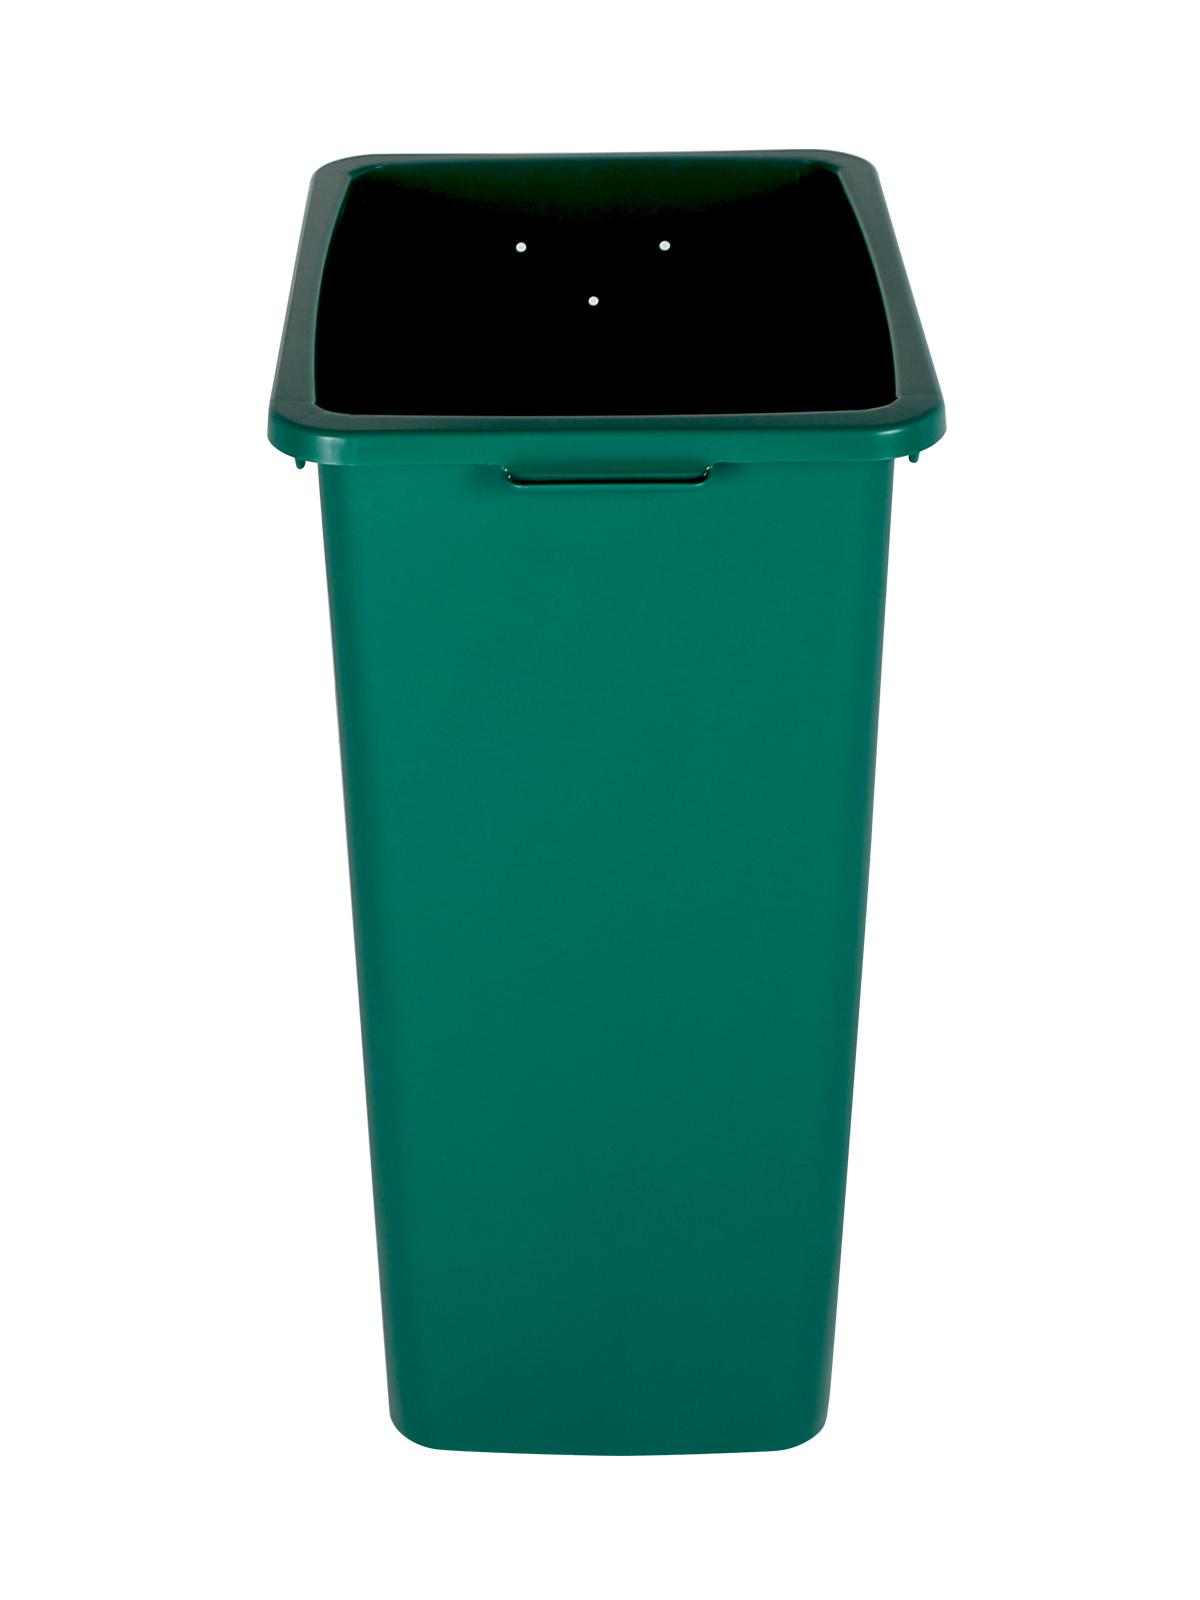 WASTE WATCHER XL - Single - Body - 30 - Mobius Loop - Dark Green